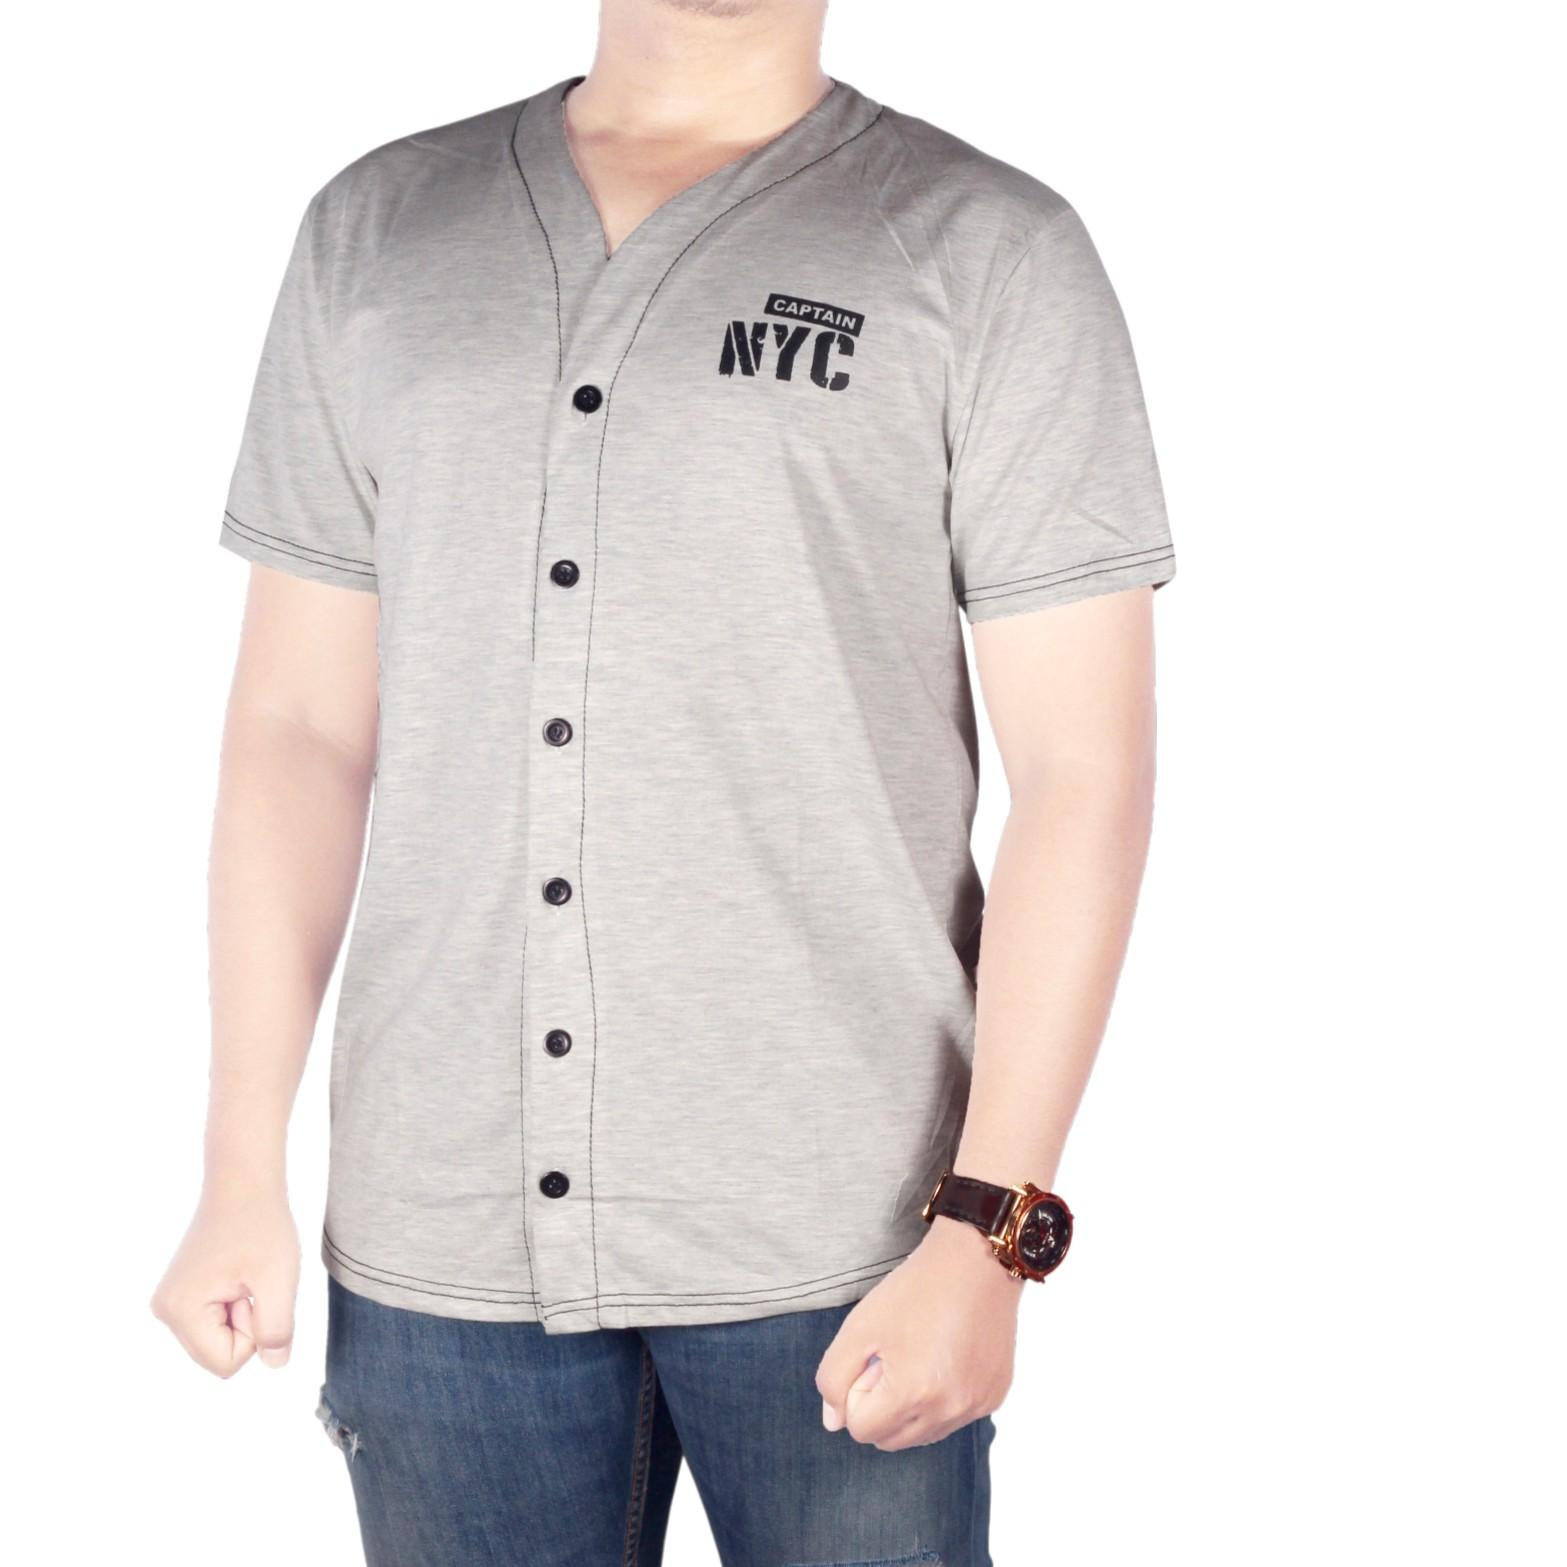 Dgm_Fashion1 Kaos Distro Pria Baseball Putih/T-Shirt Baseball Man Blue Supreme/Baju